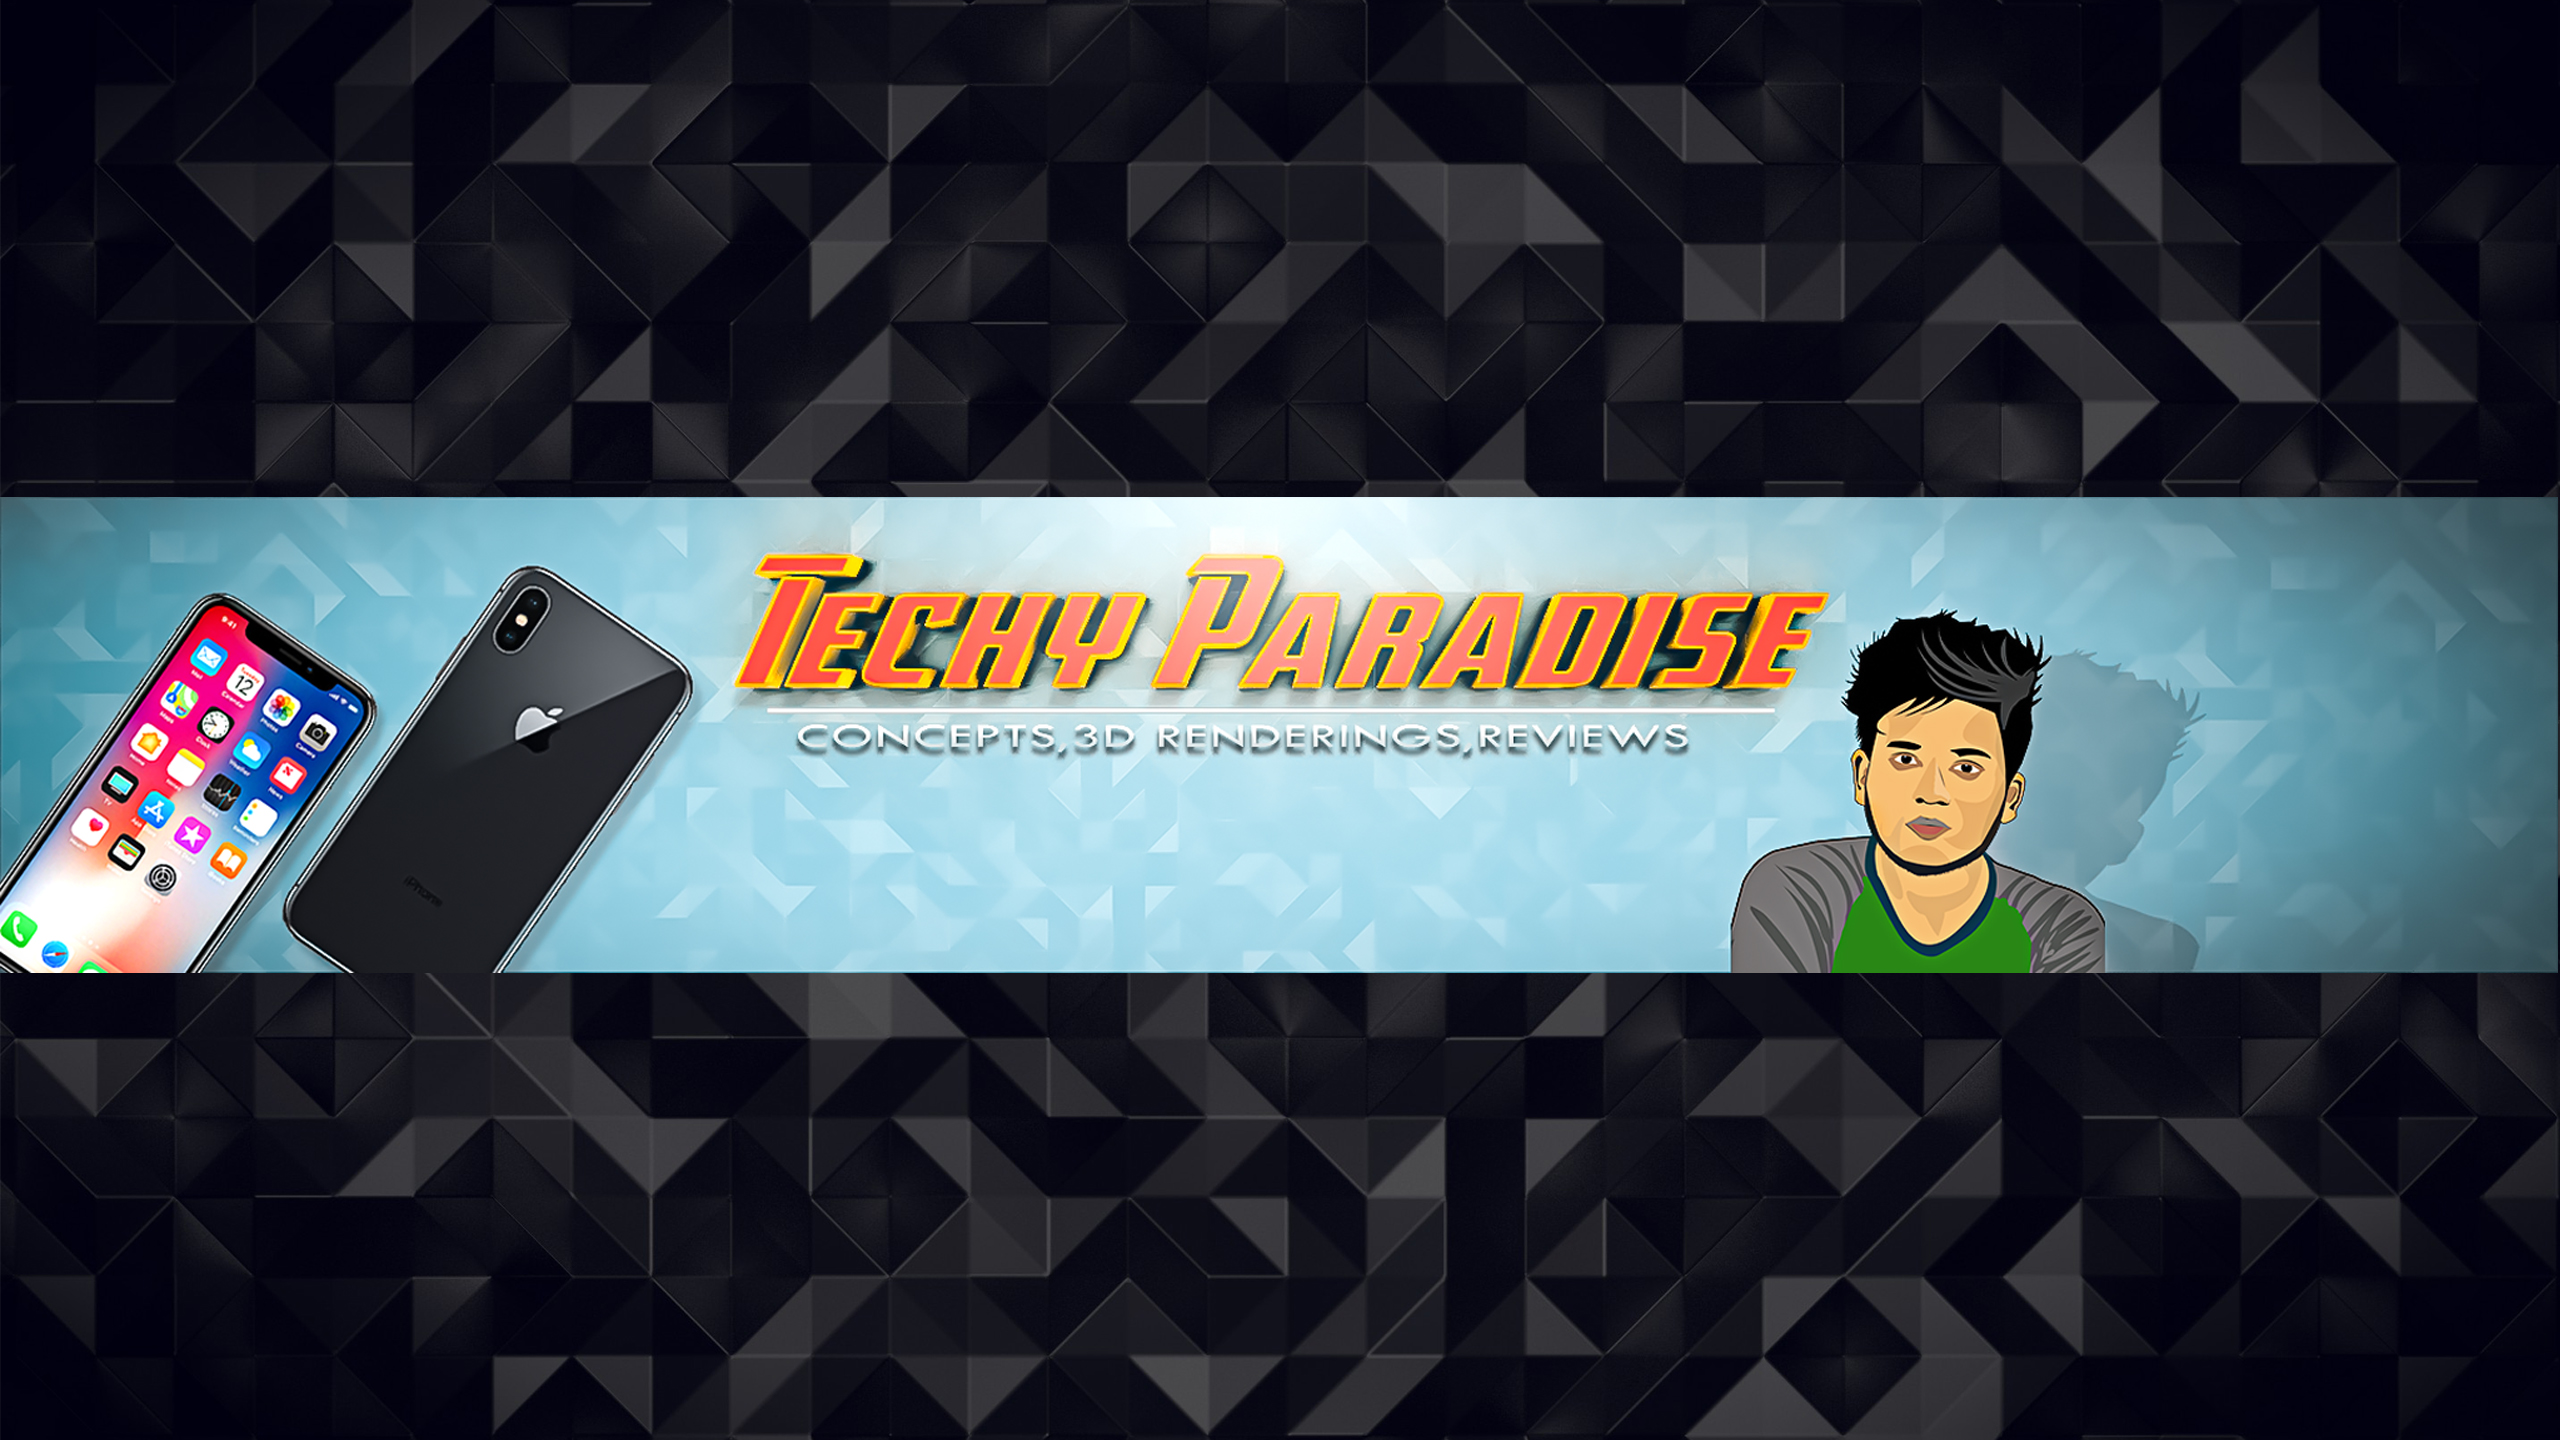 Techy Pradise